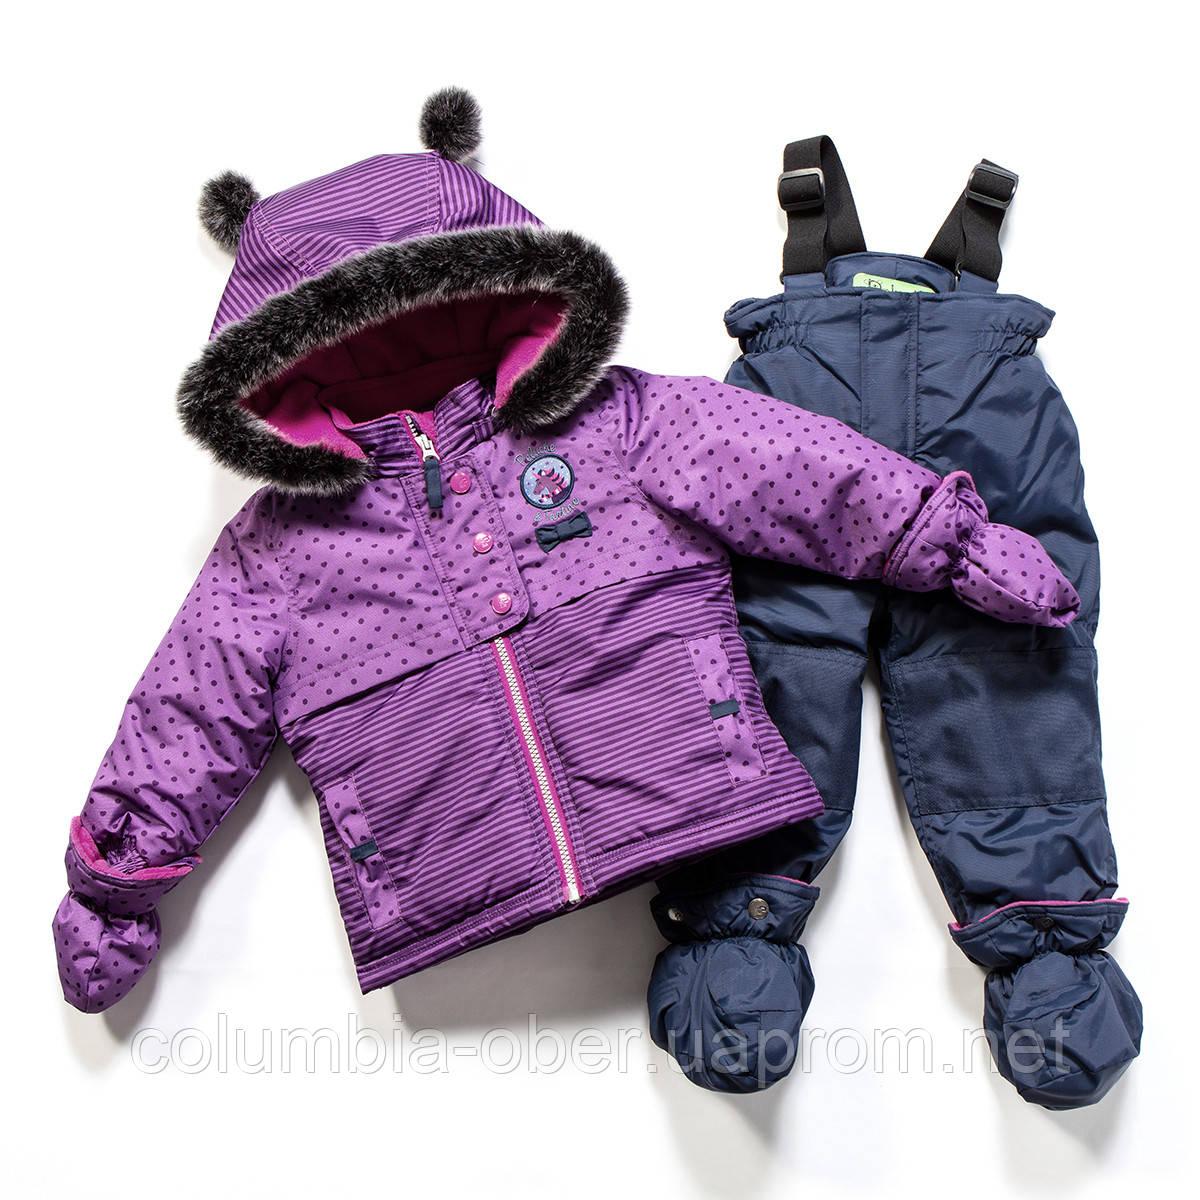 Зимний костюм для девочки PELUCHE F17 M 08 BF Purple Wave / Pale Navy. Размеры 75 - 97.